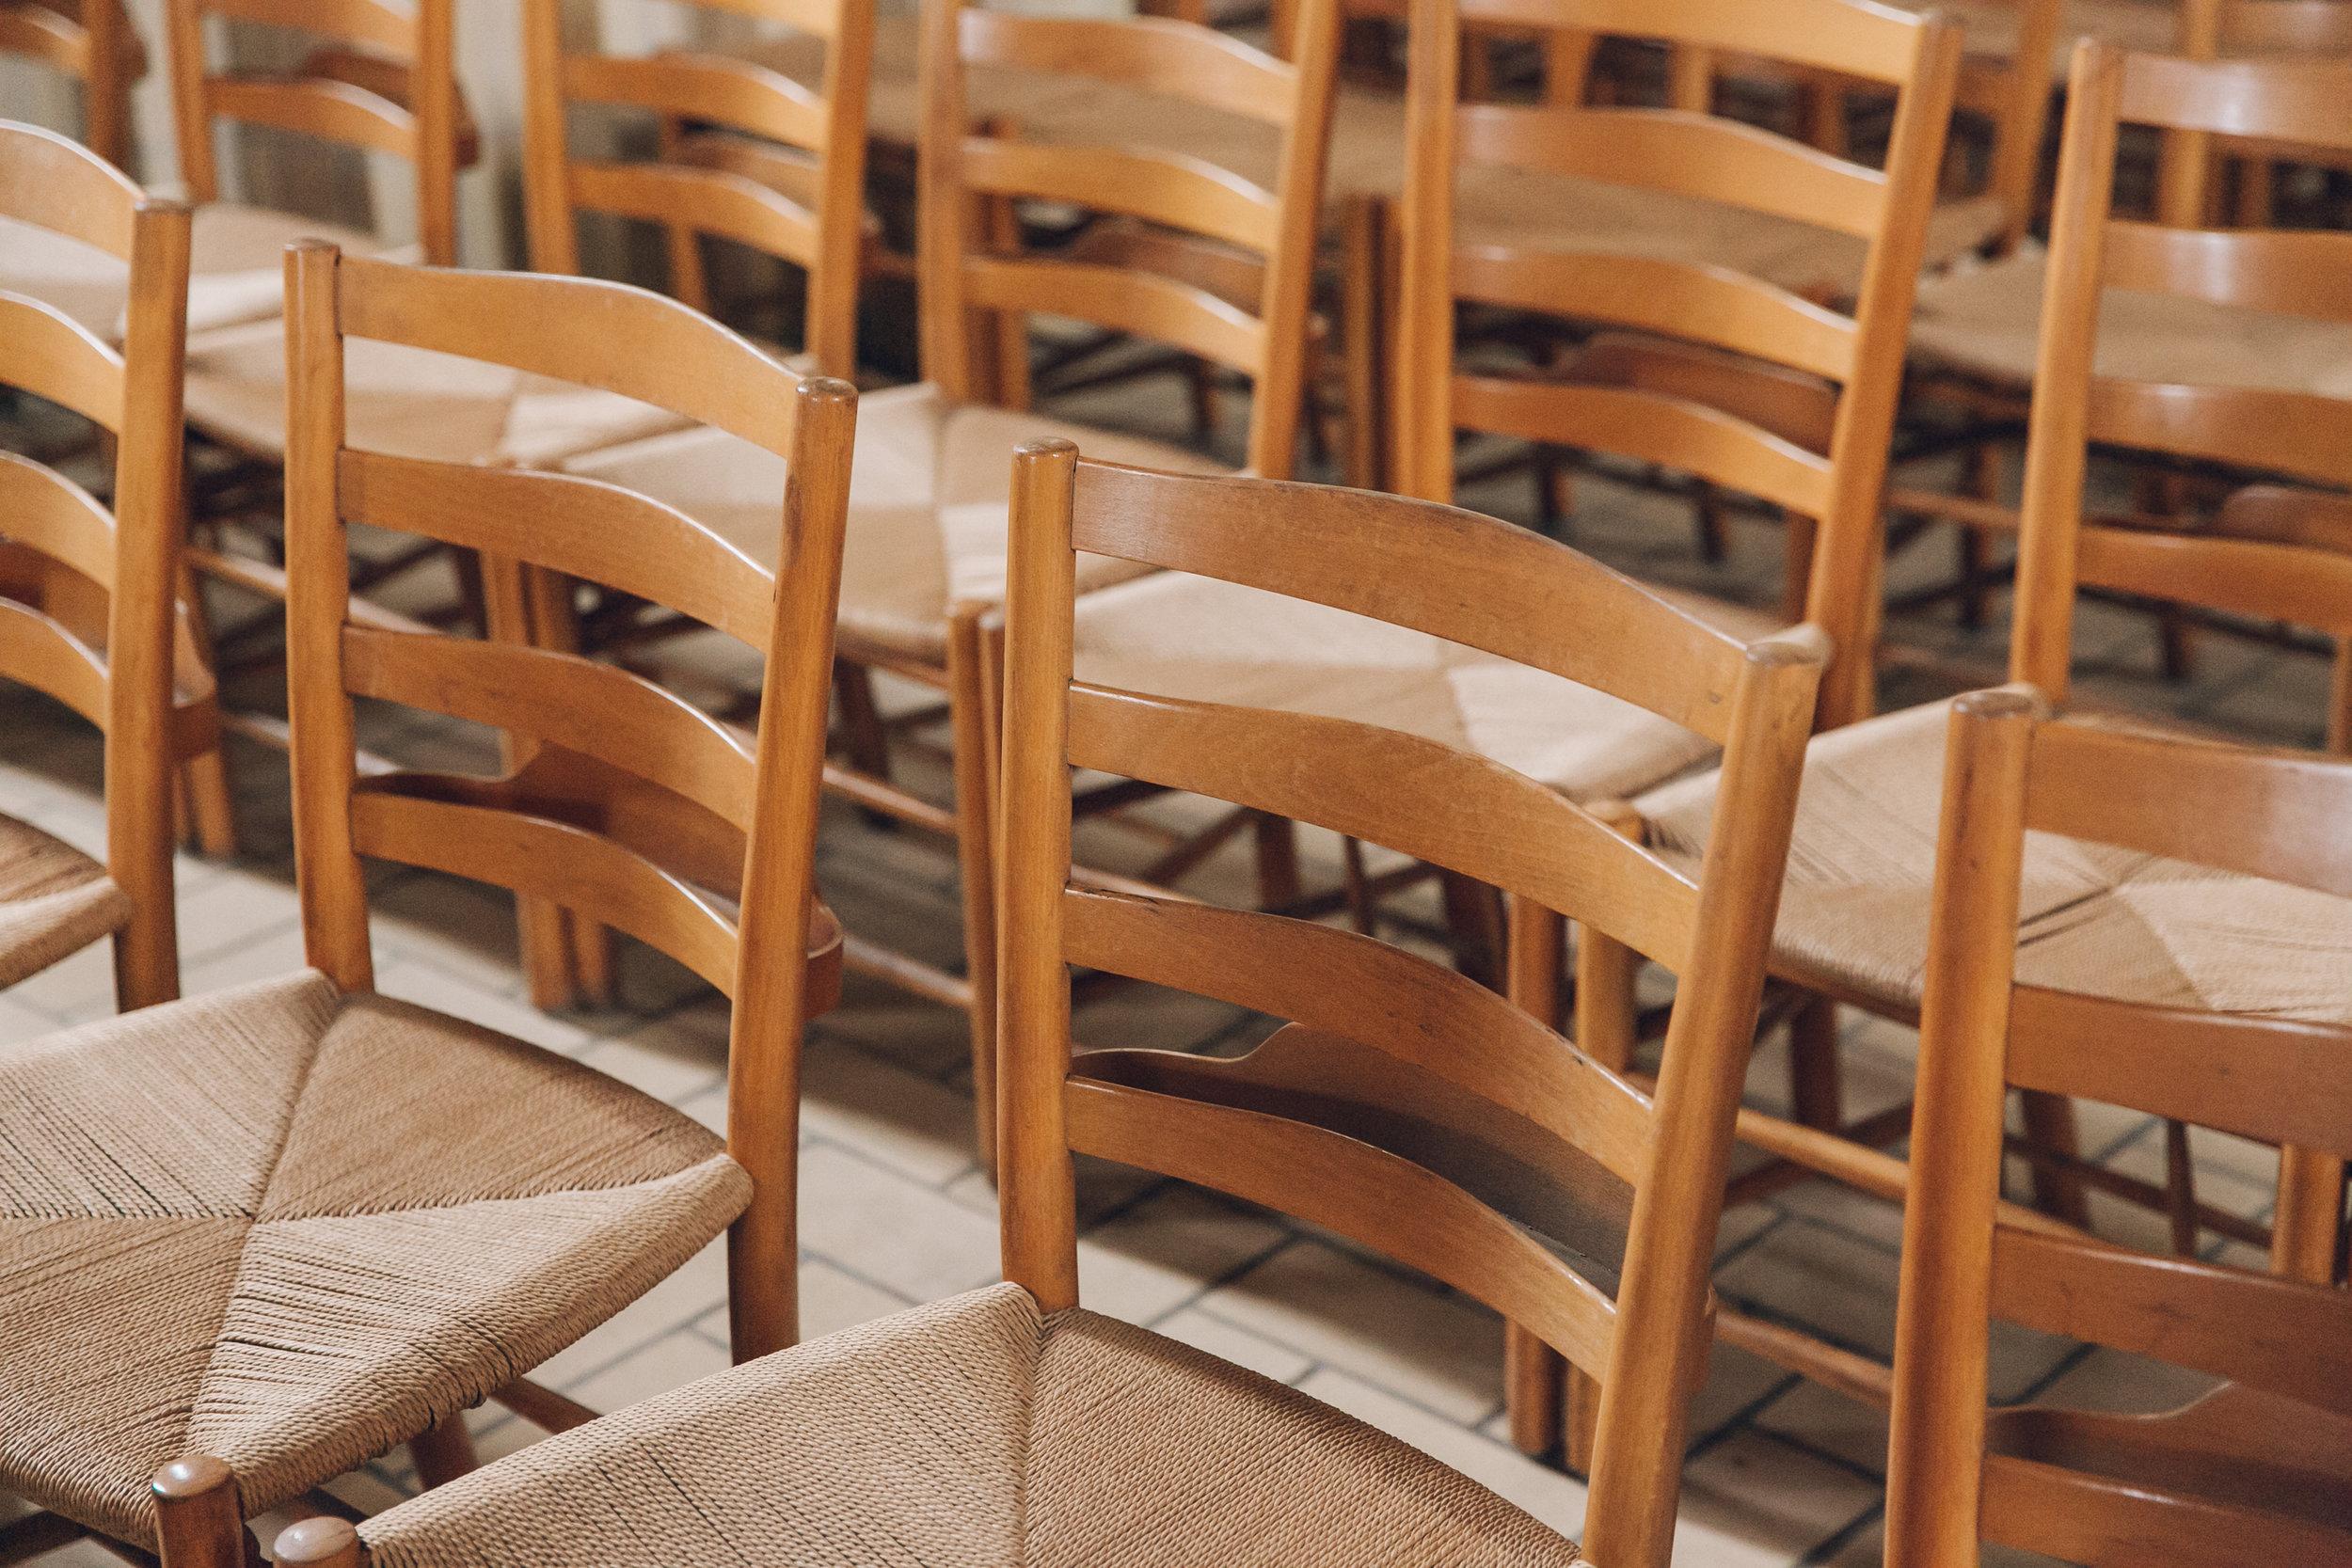 Wooden chairs at Grundtvig's Church in Copenhagen.